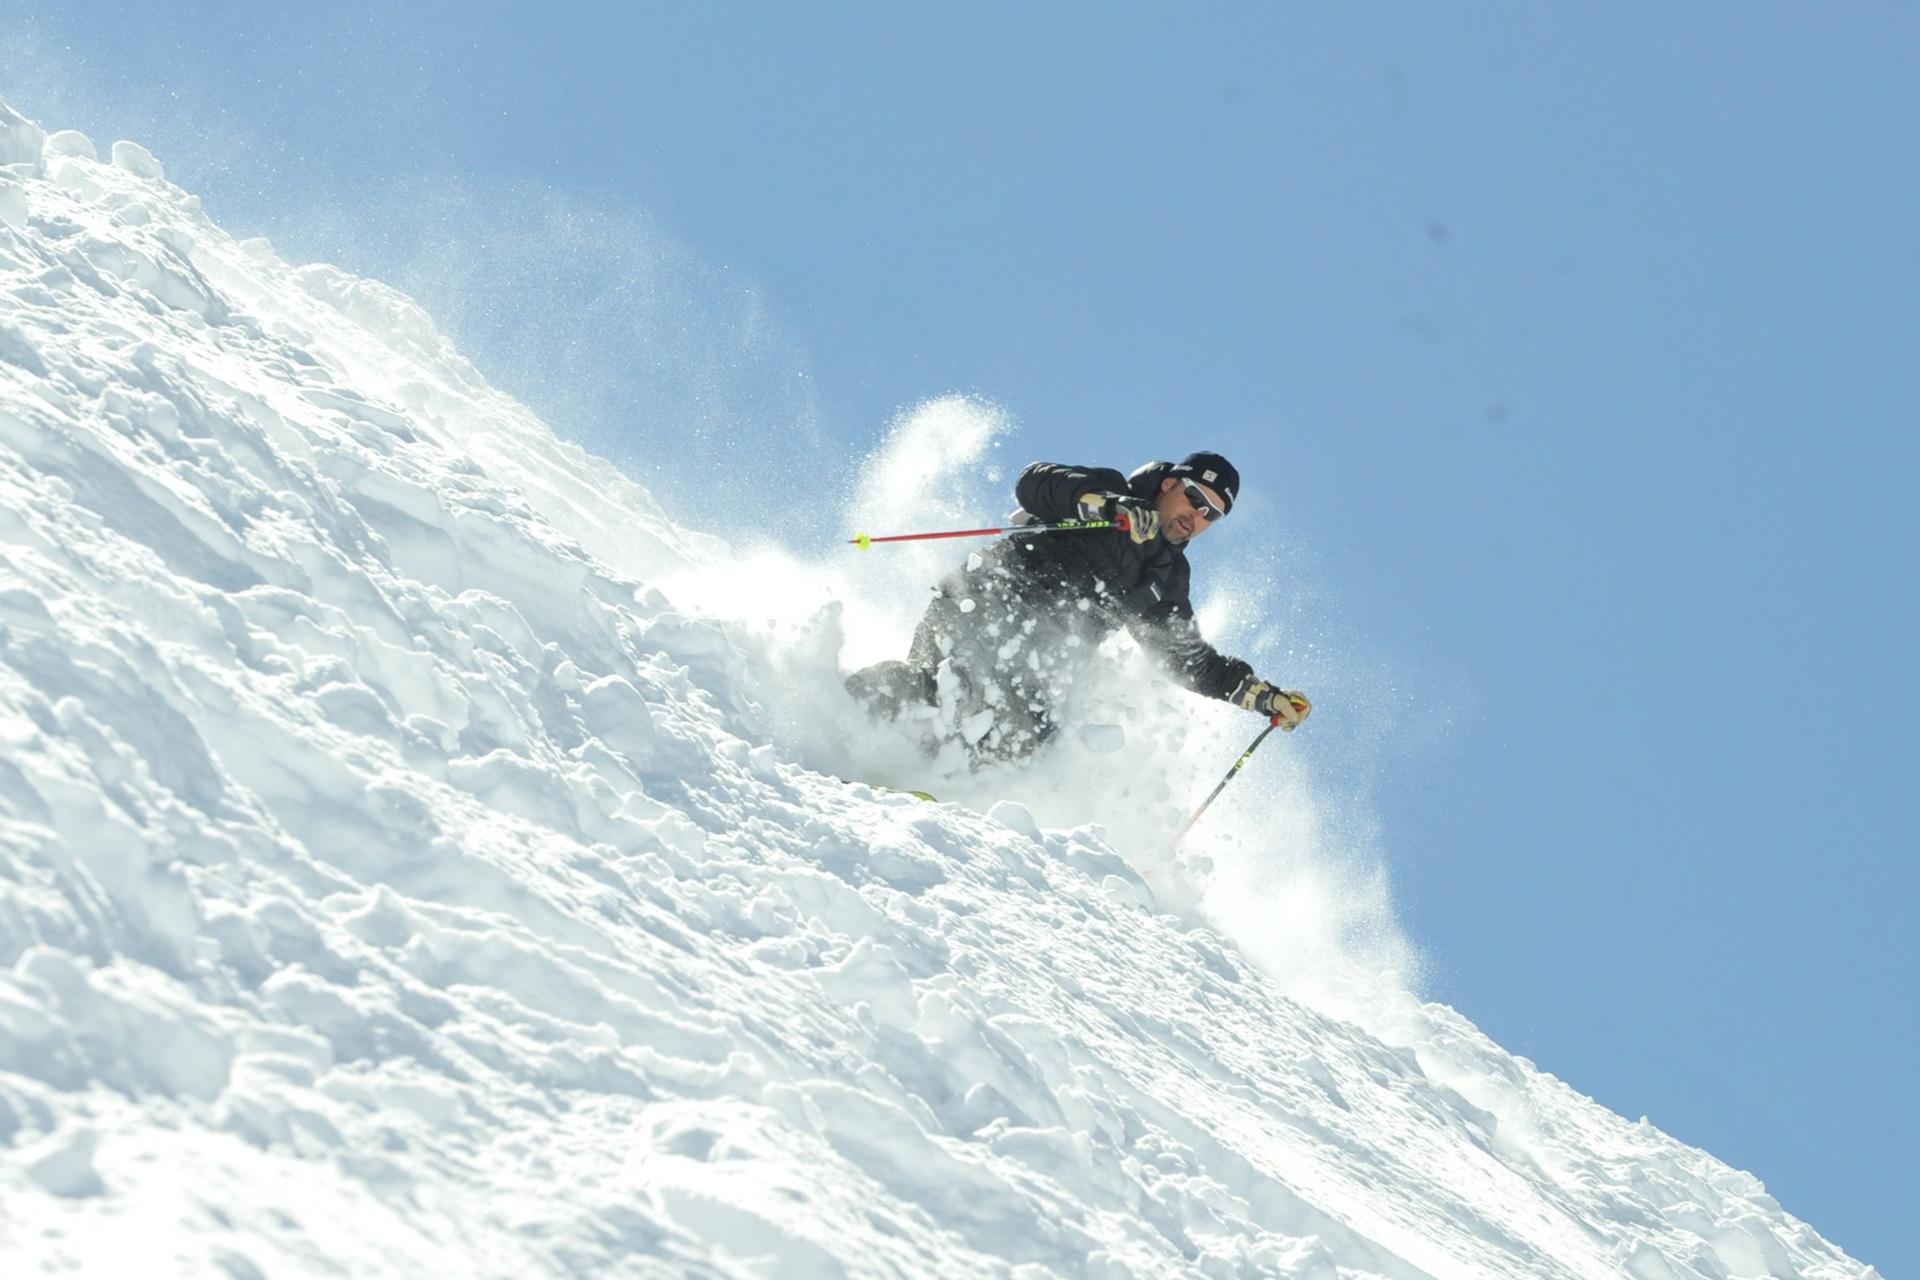 freeride on the snow